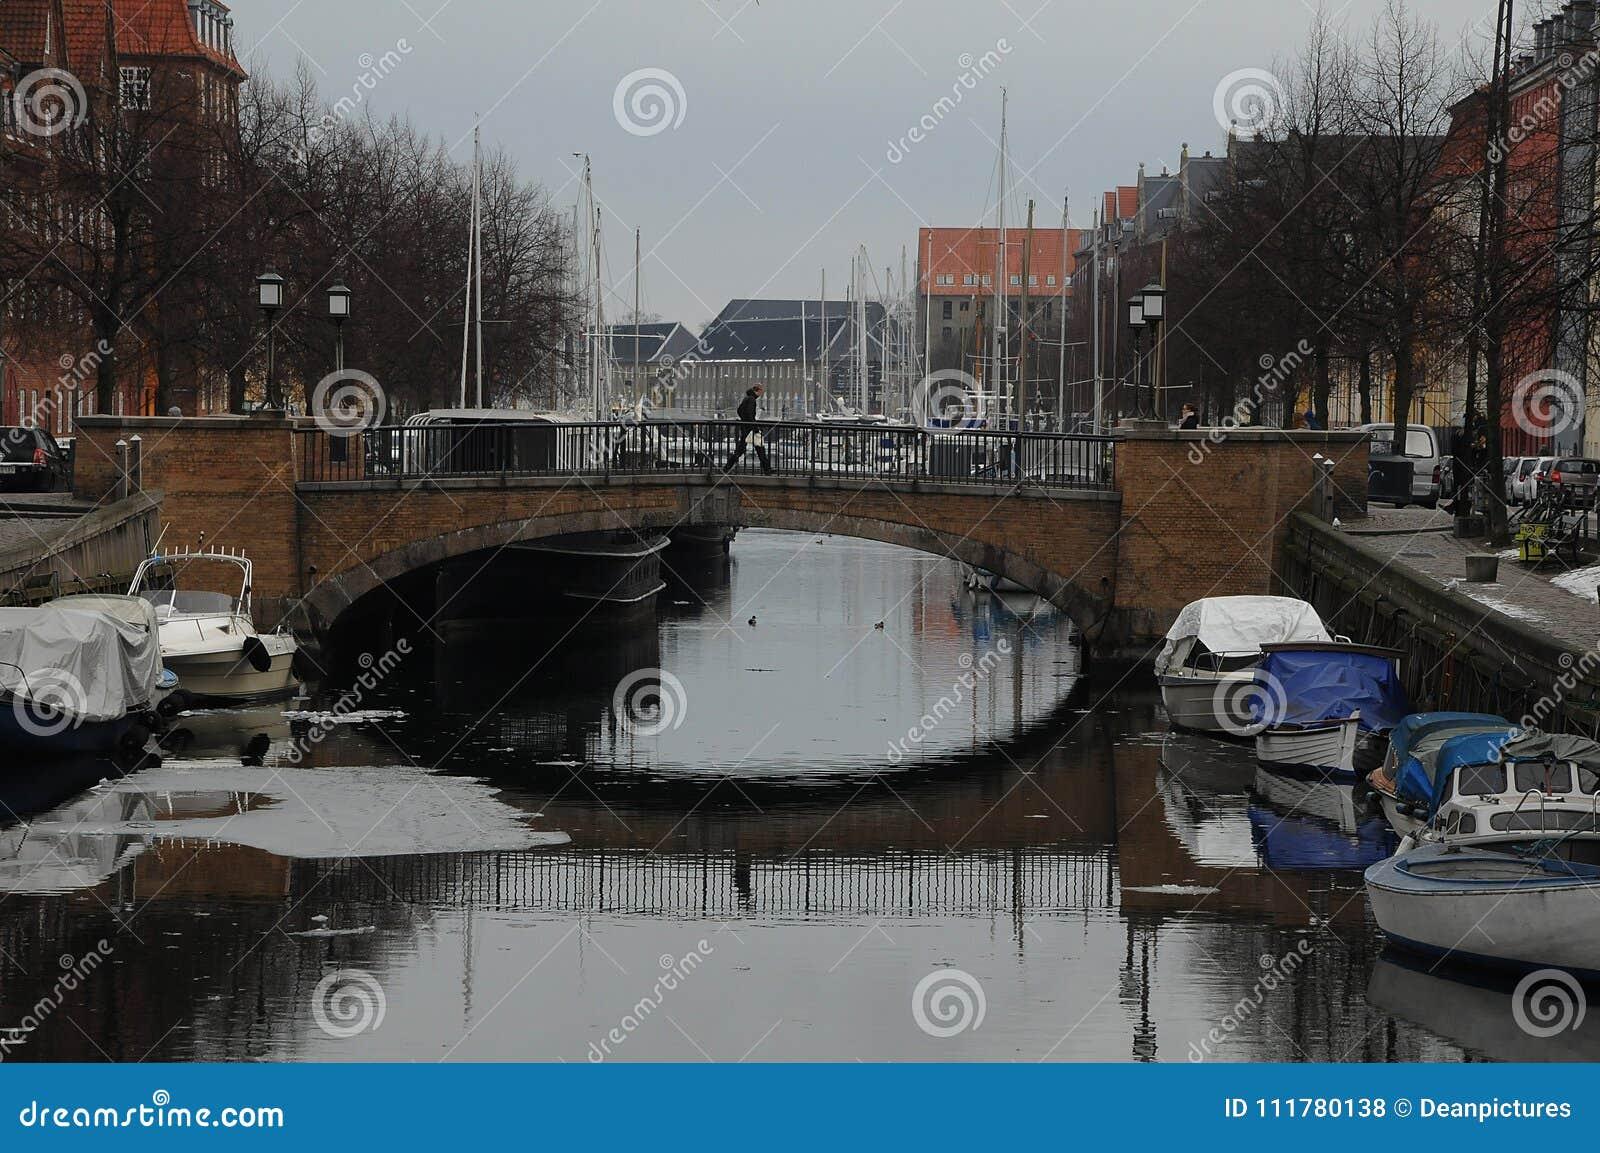 BOATS AT CHRISTIANSHAVN CANAL